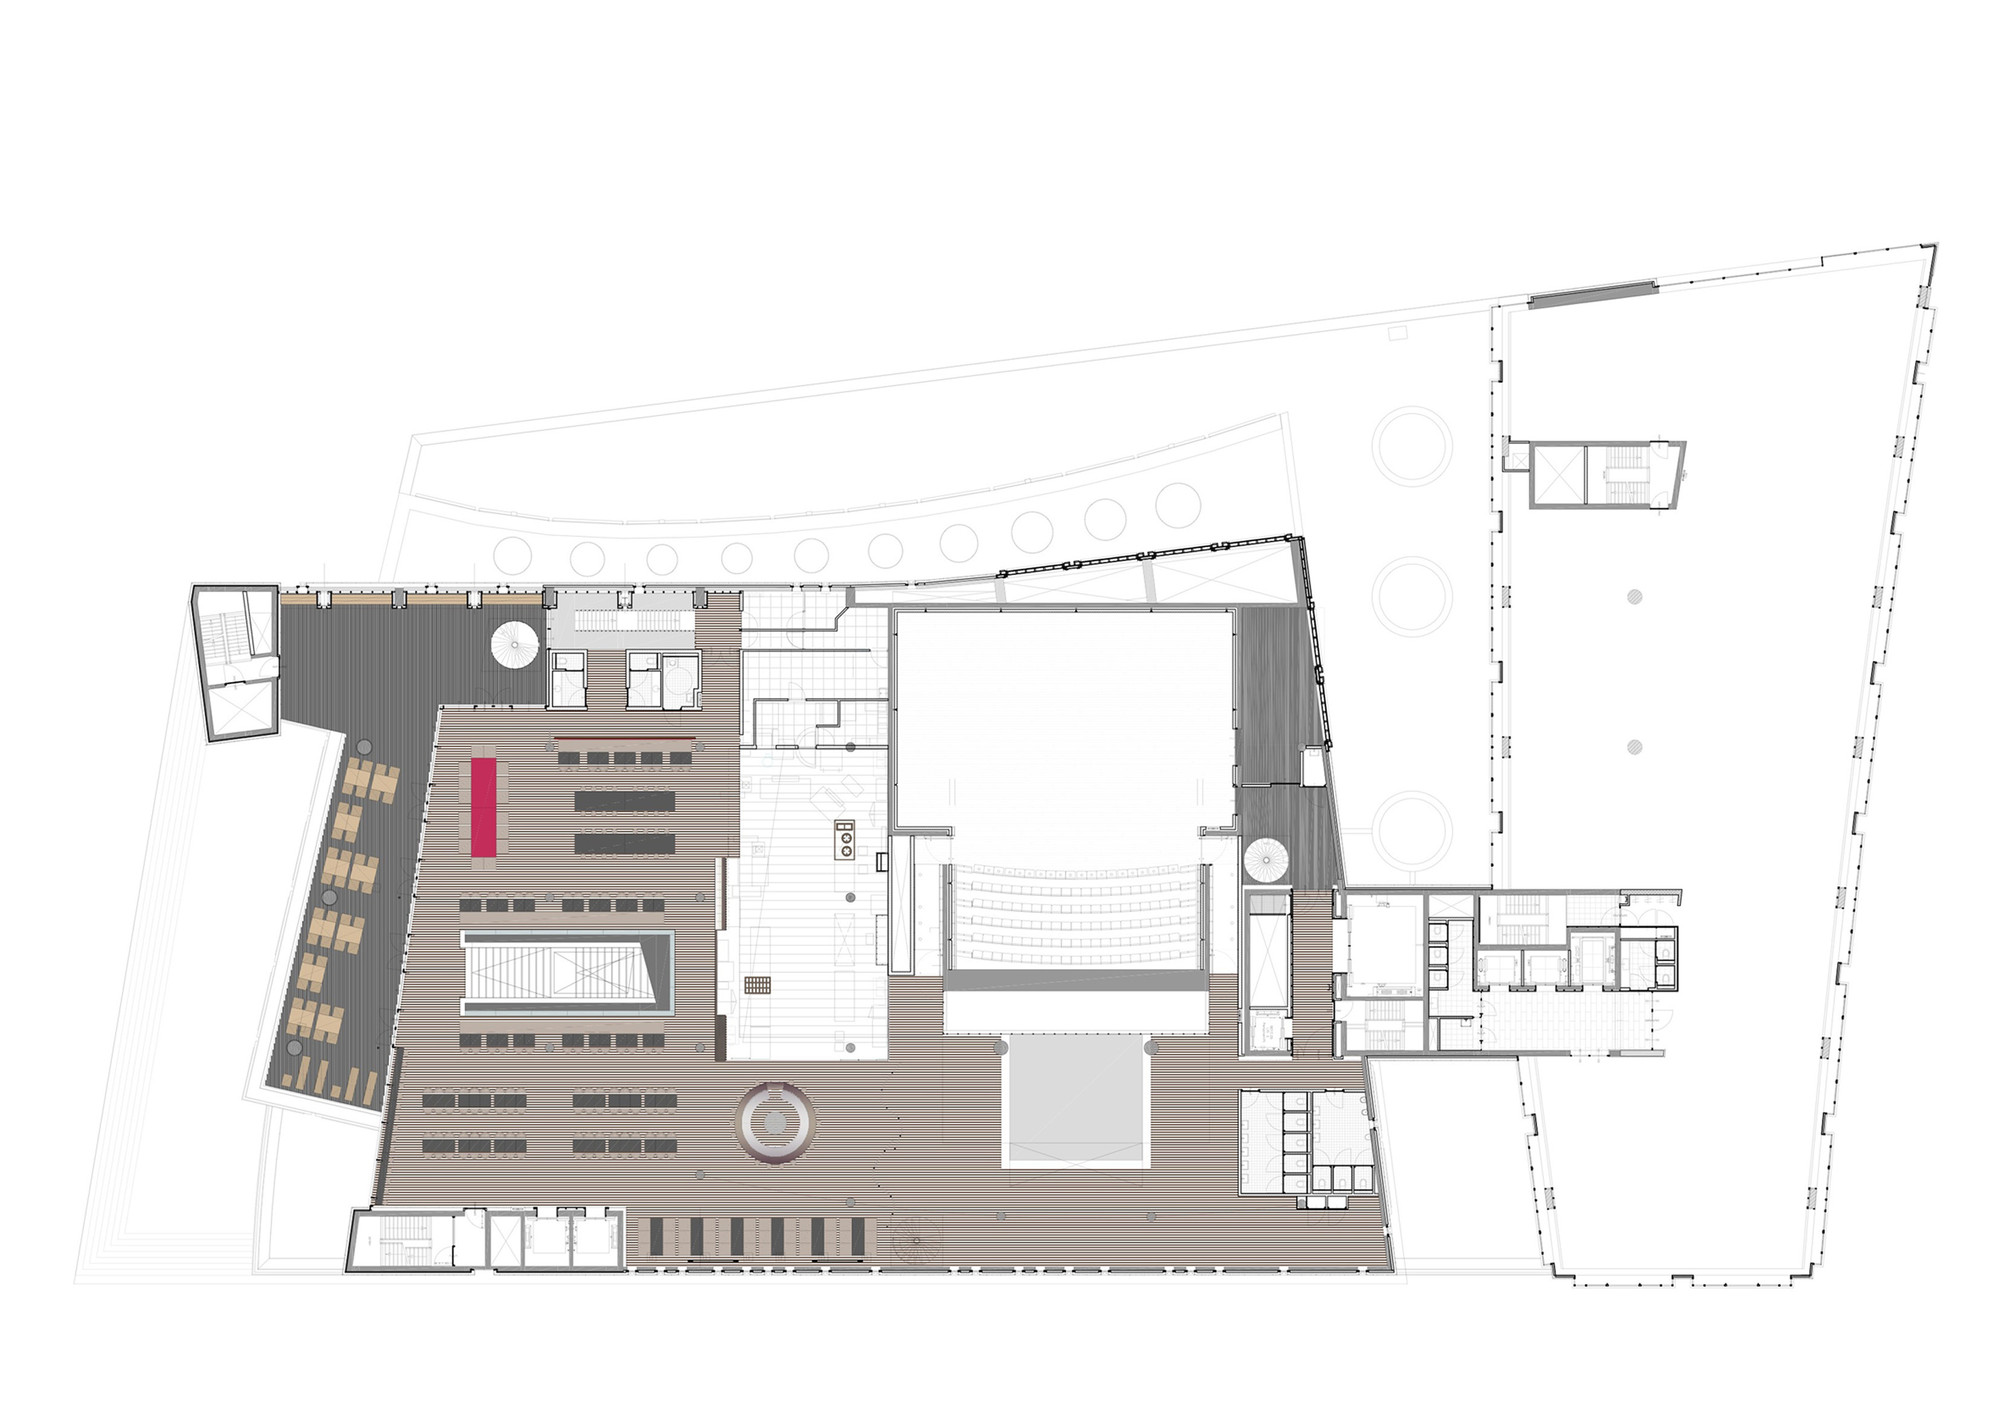 Sample Floor Plan Of A Restaurant Gallery Of Public Library Amsterdam Jo Coenen Amp Co